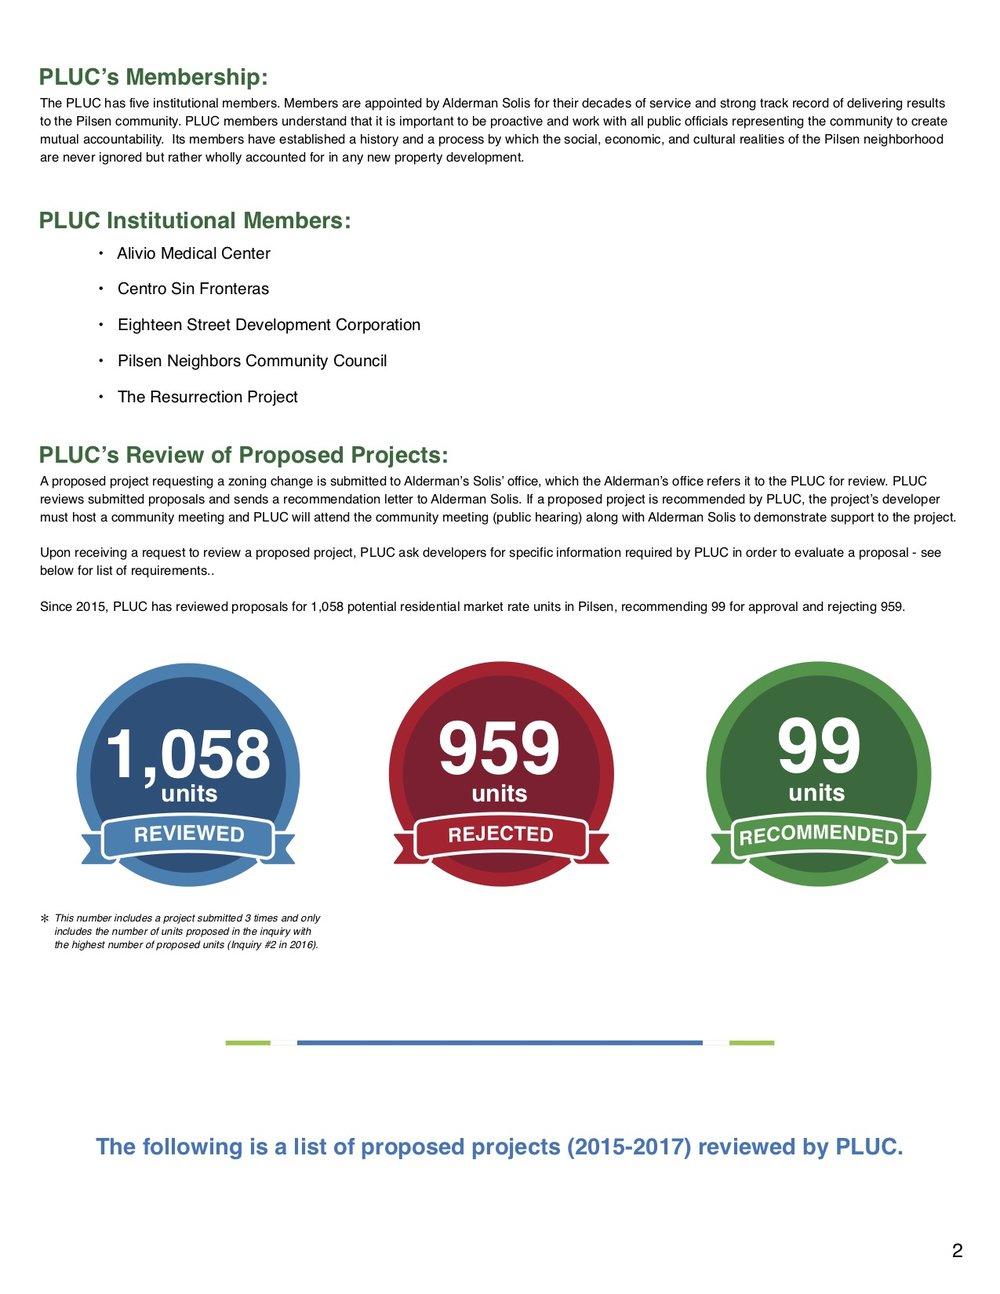 PLUC-Activity-Report.Final_2.jpg